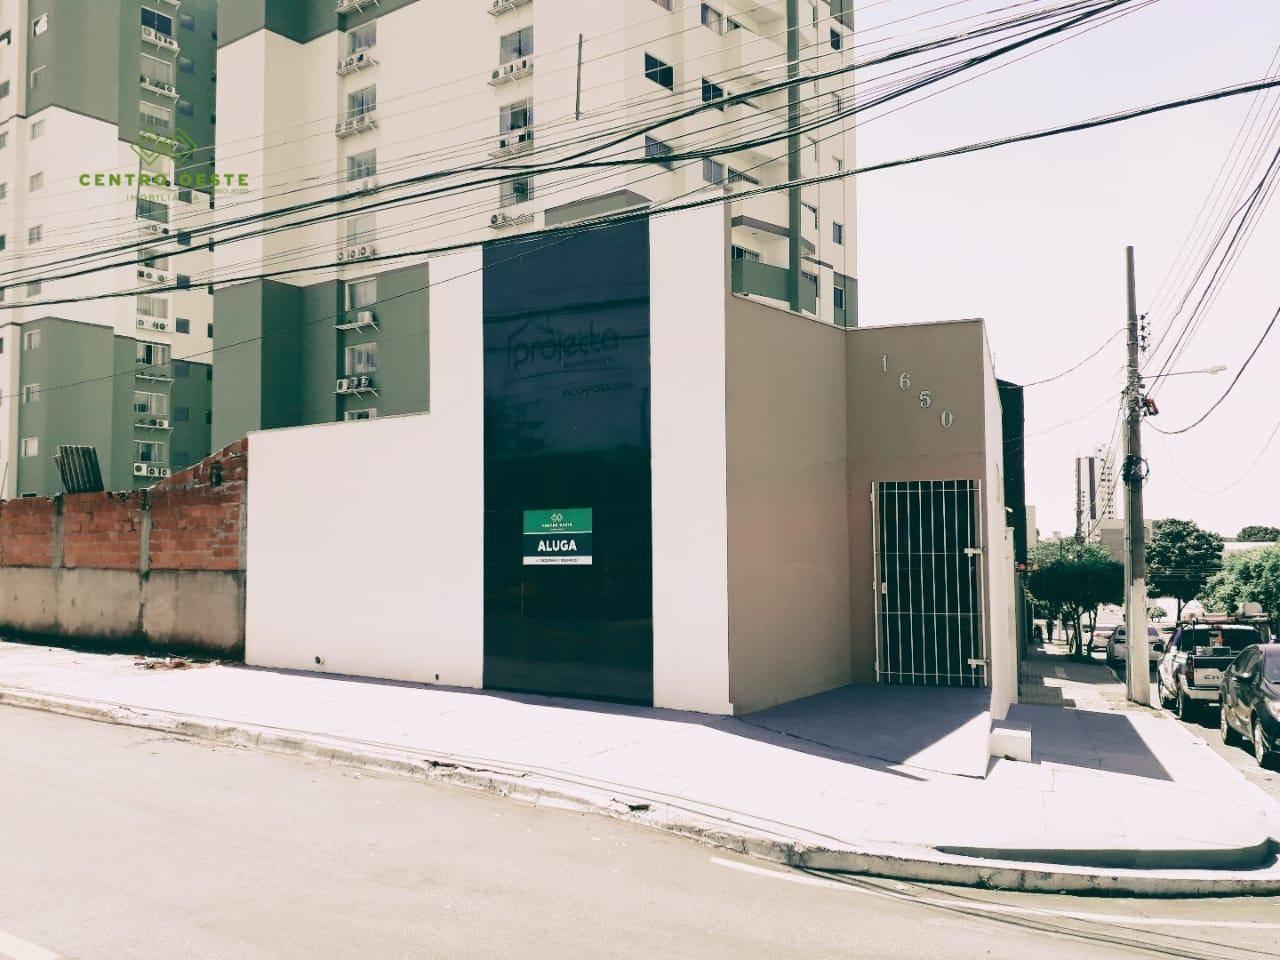 Sala para alugar, 110 m² por R$ 1.700,00/mês - Vila José Luiz - Rondonópolis/MT